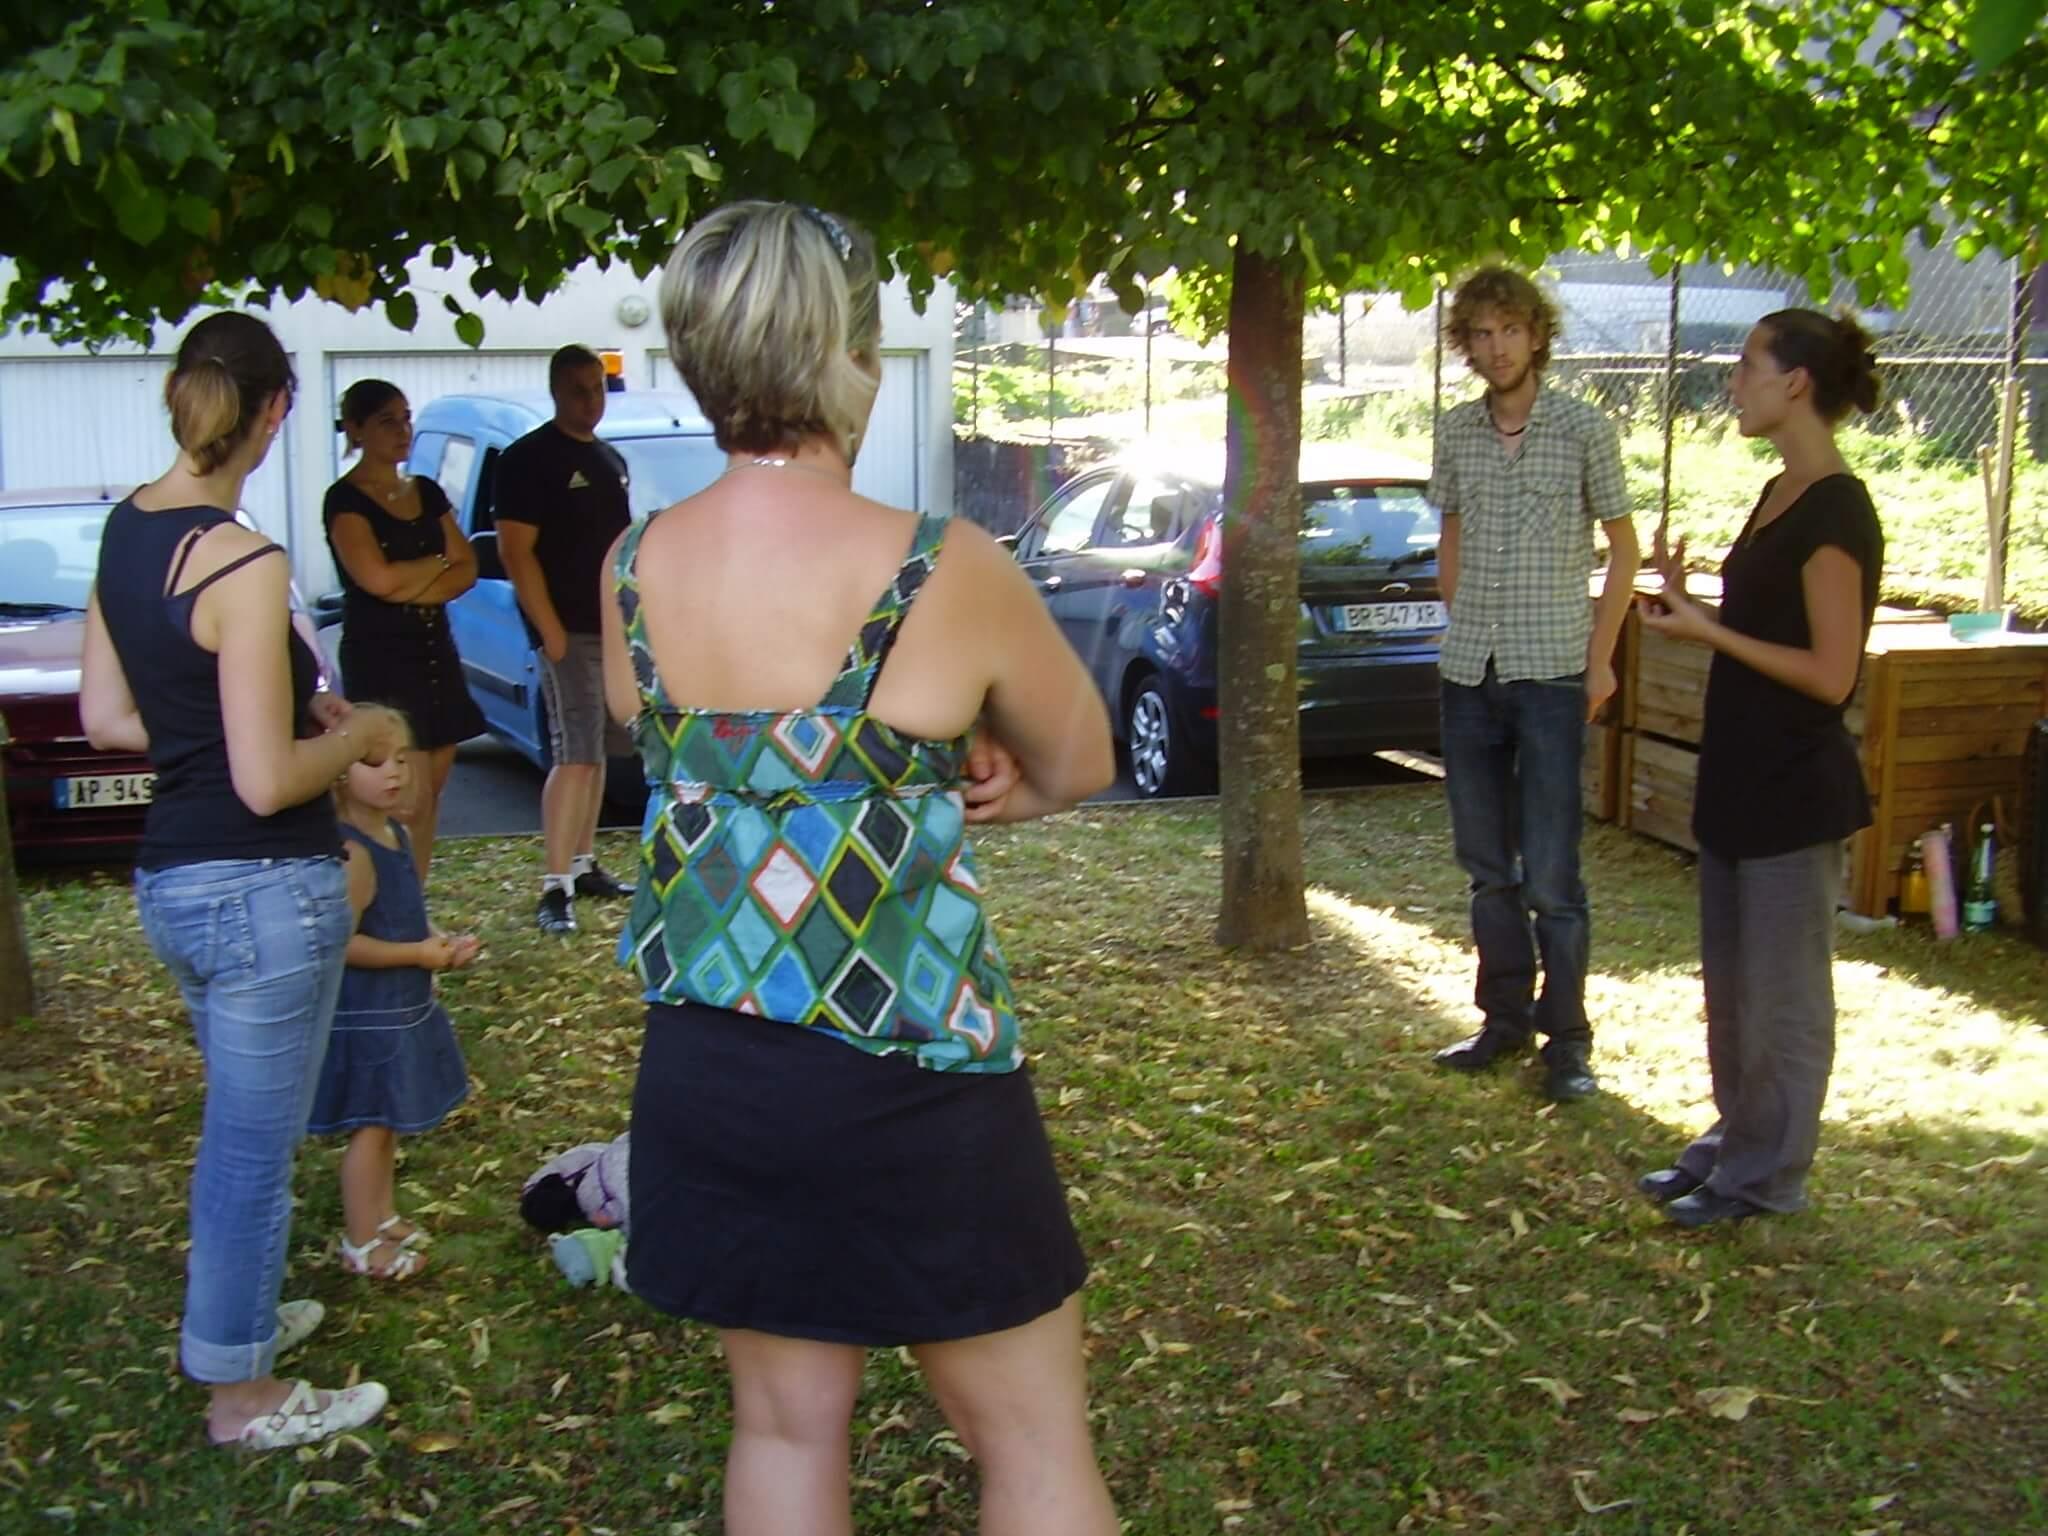 Inauguration rue Lanchy (Septembre 13, Besançon)